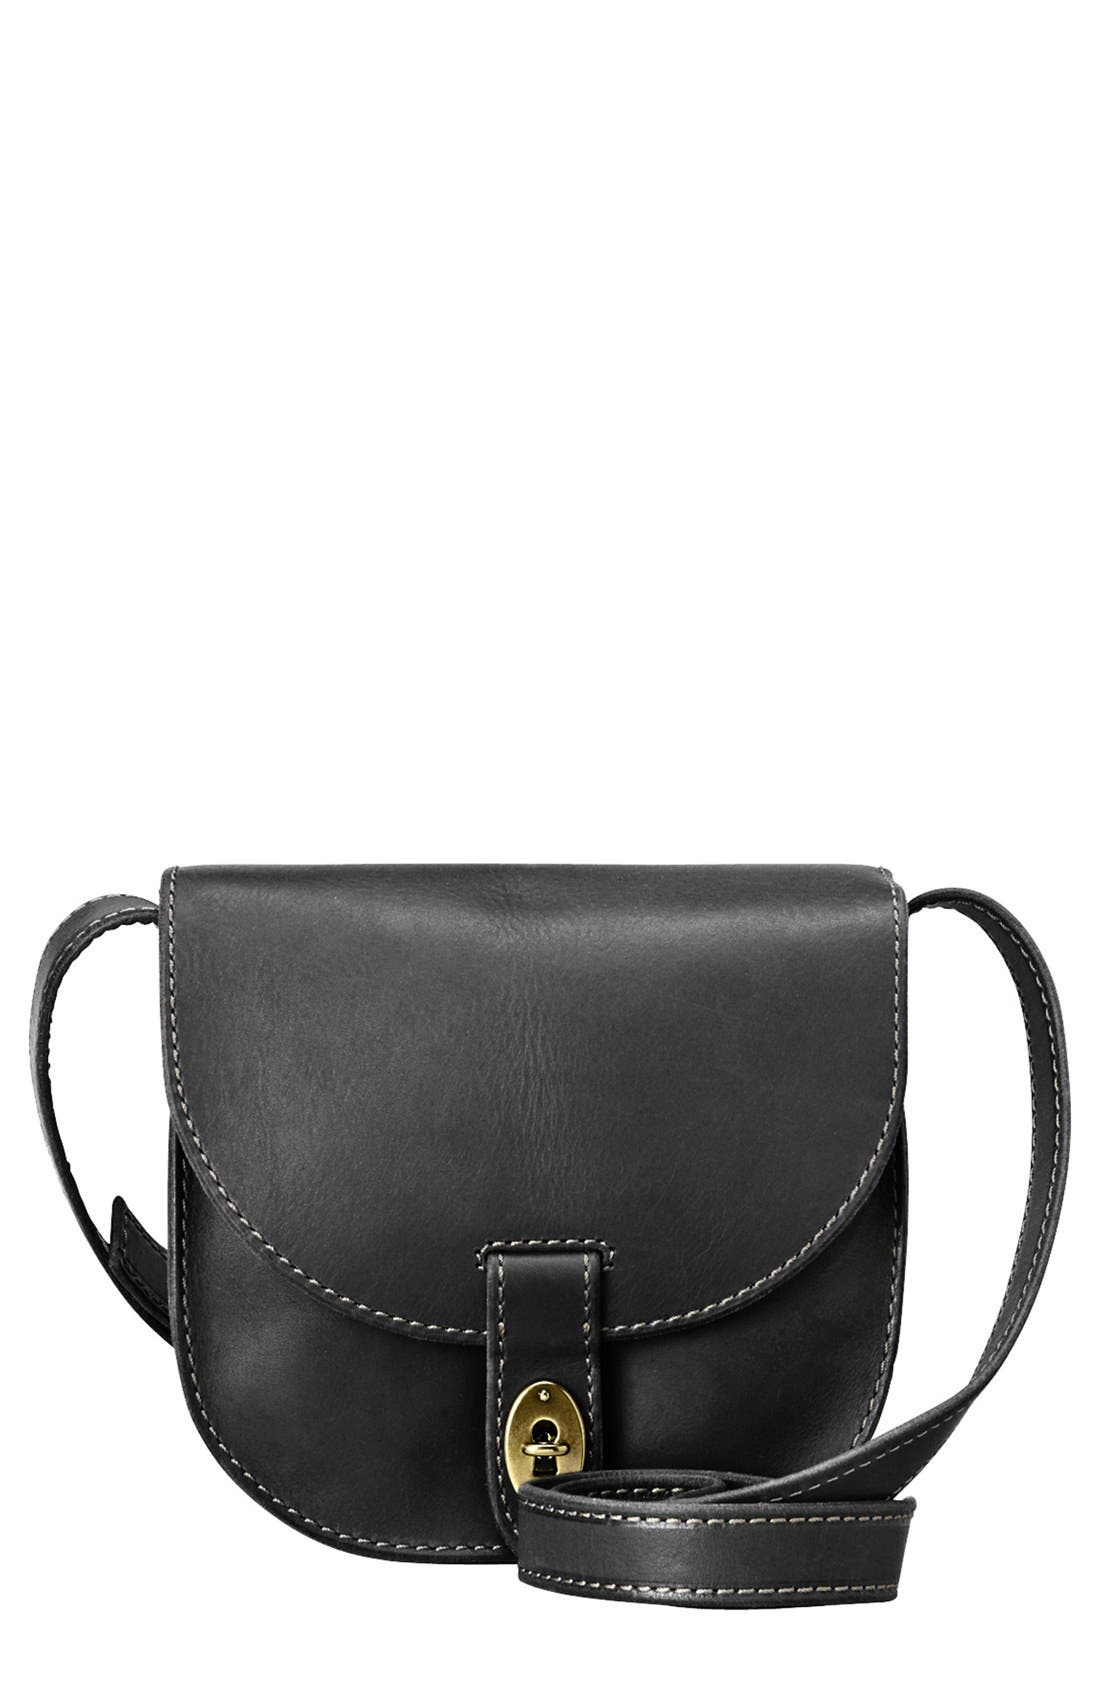 'Austin - Small' Crossbody Bag,                             Main thumbnail 1, color,                             001